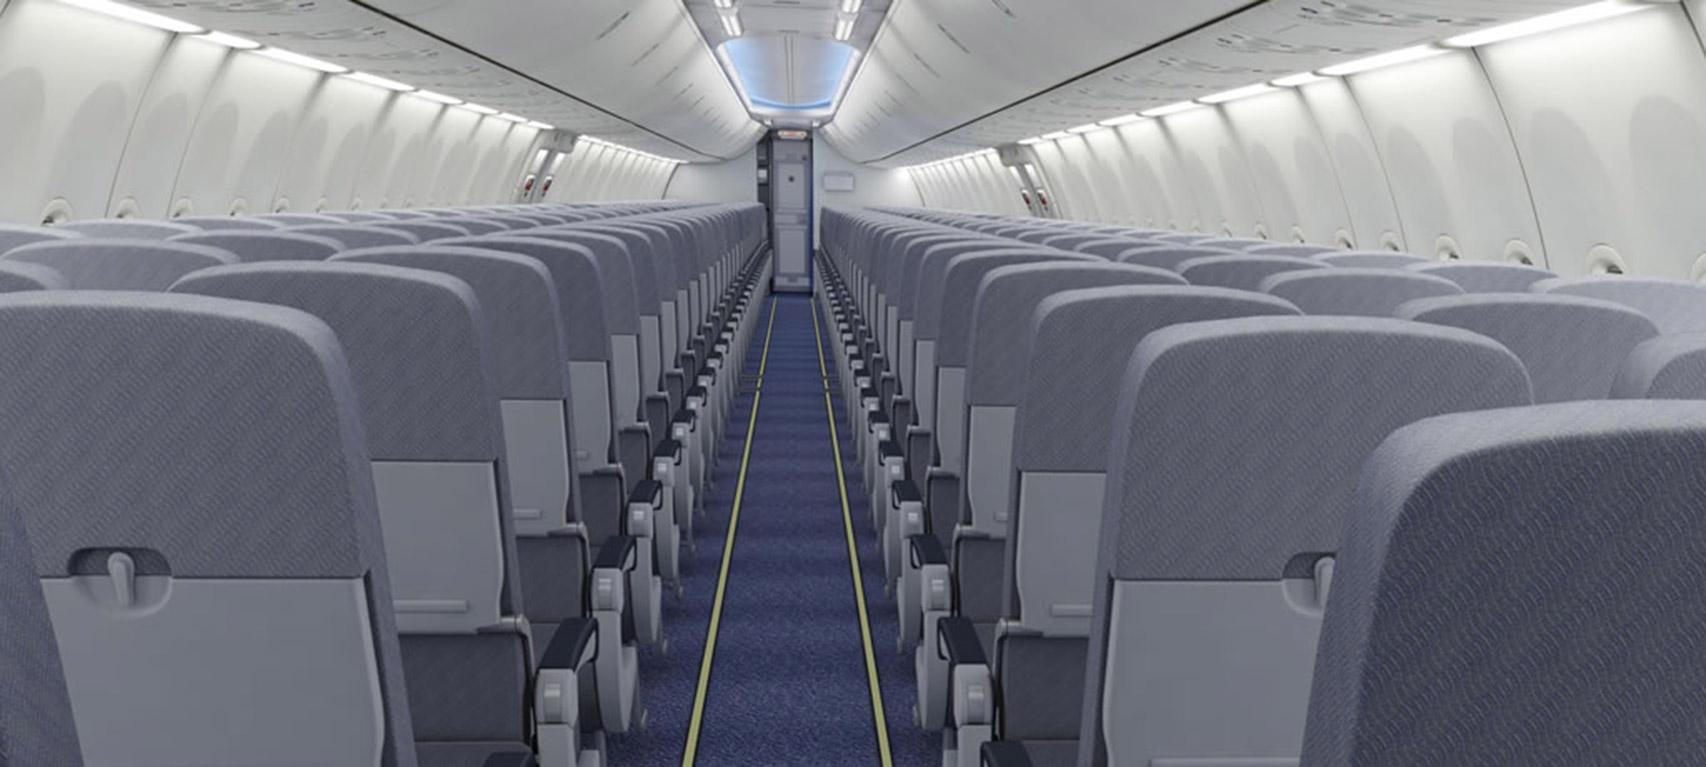 boeing-737-interior